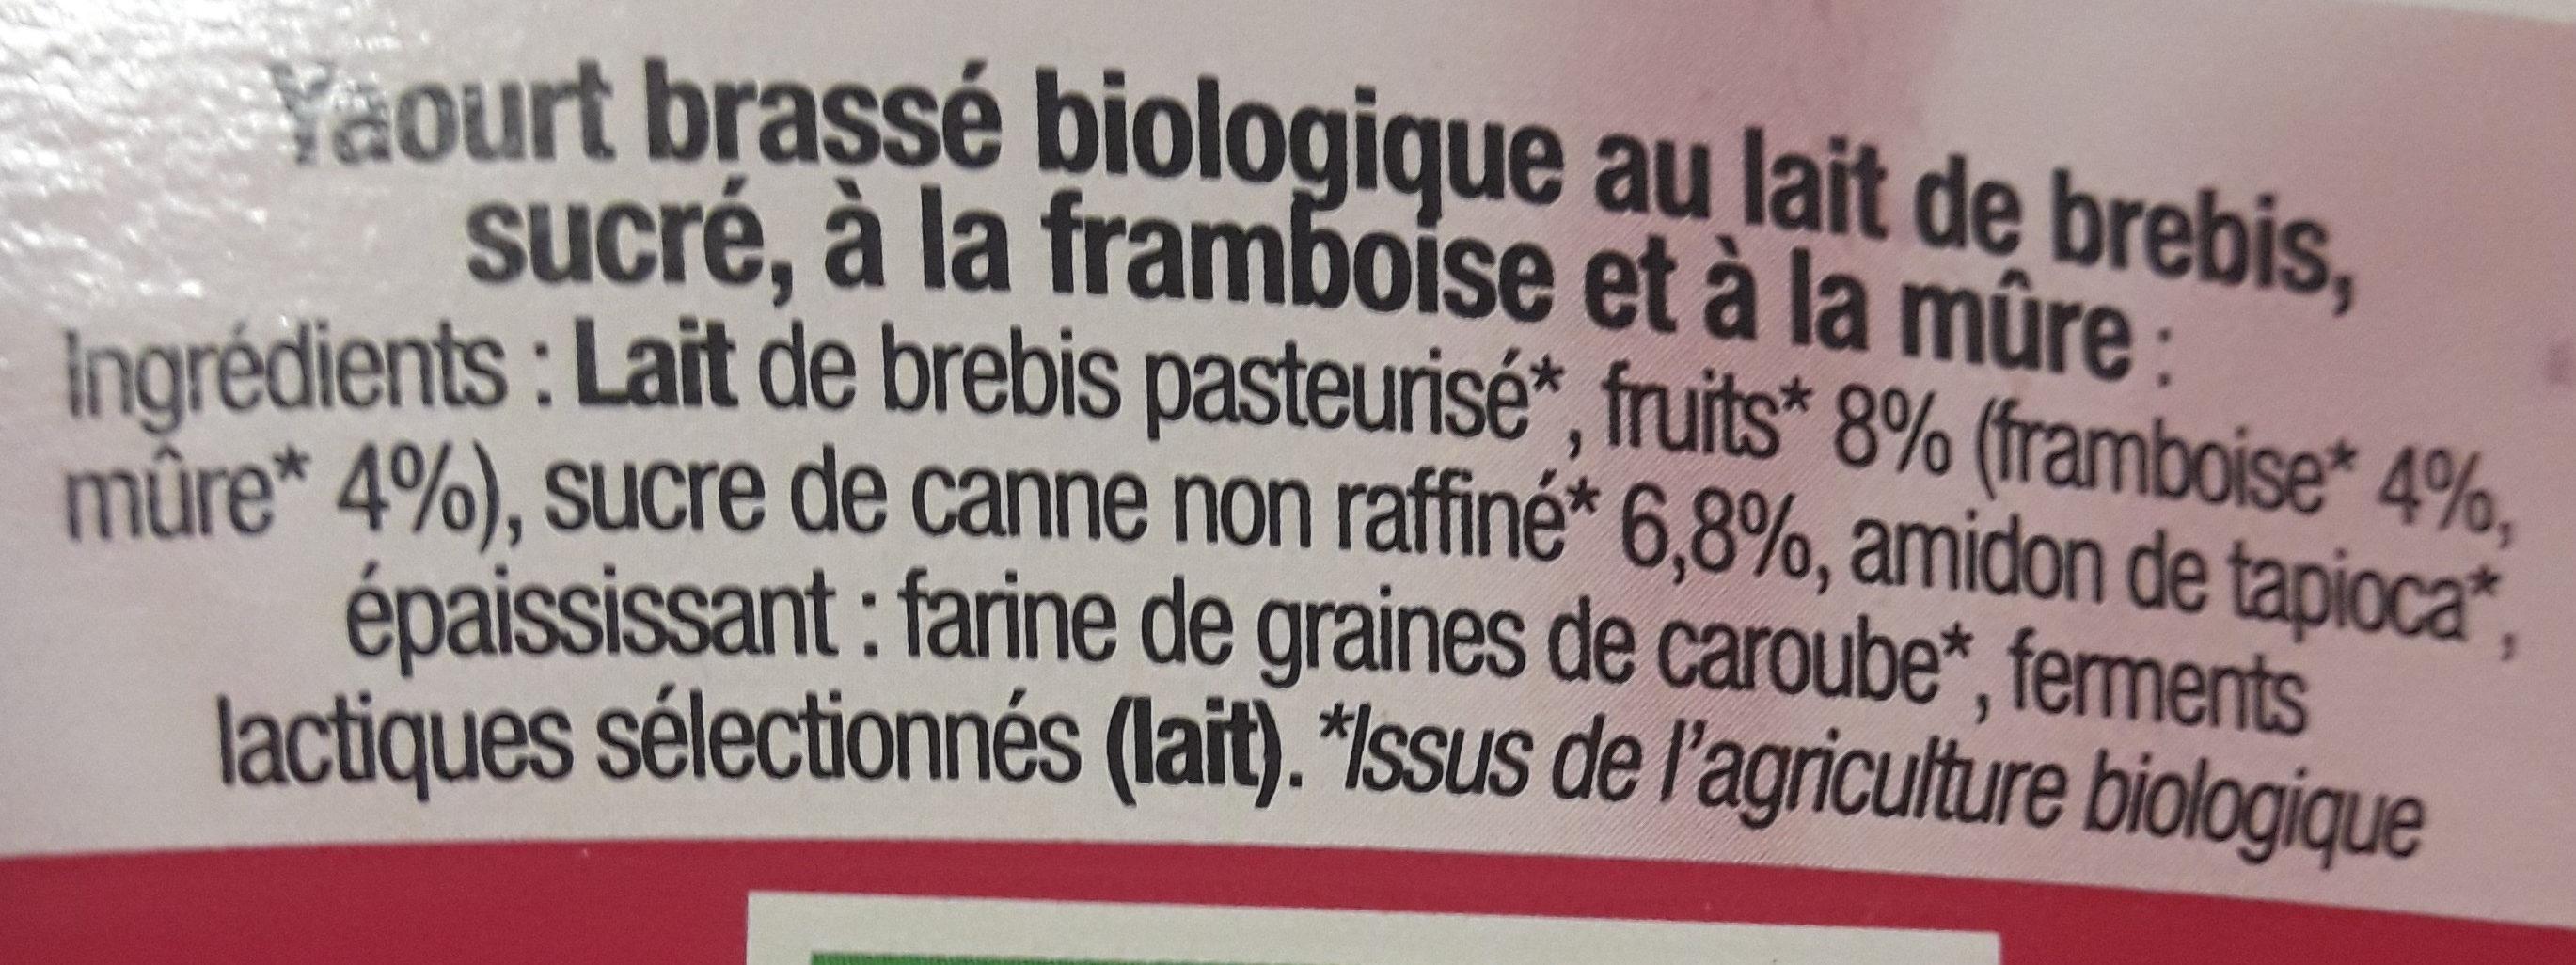 Brassé framboise mûre - Ingredients